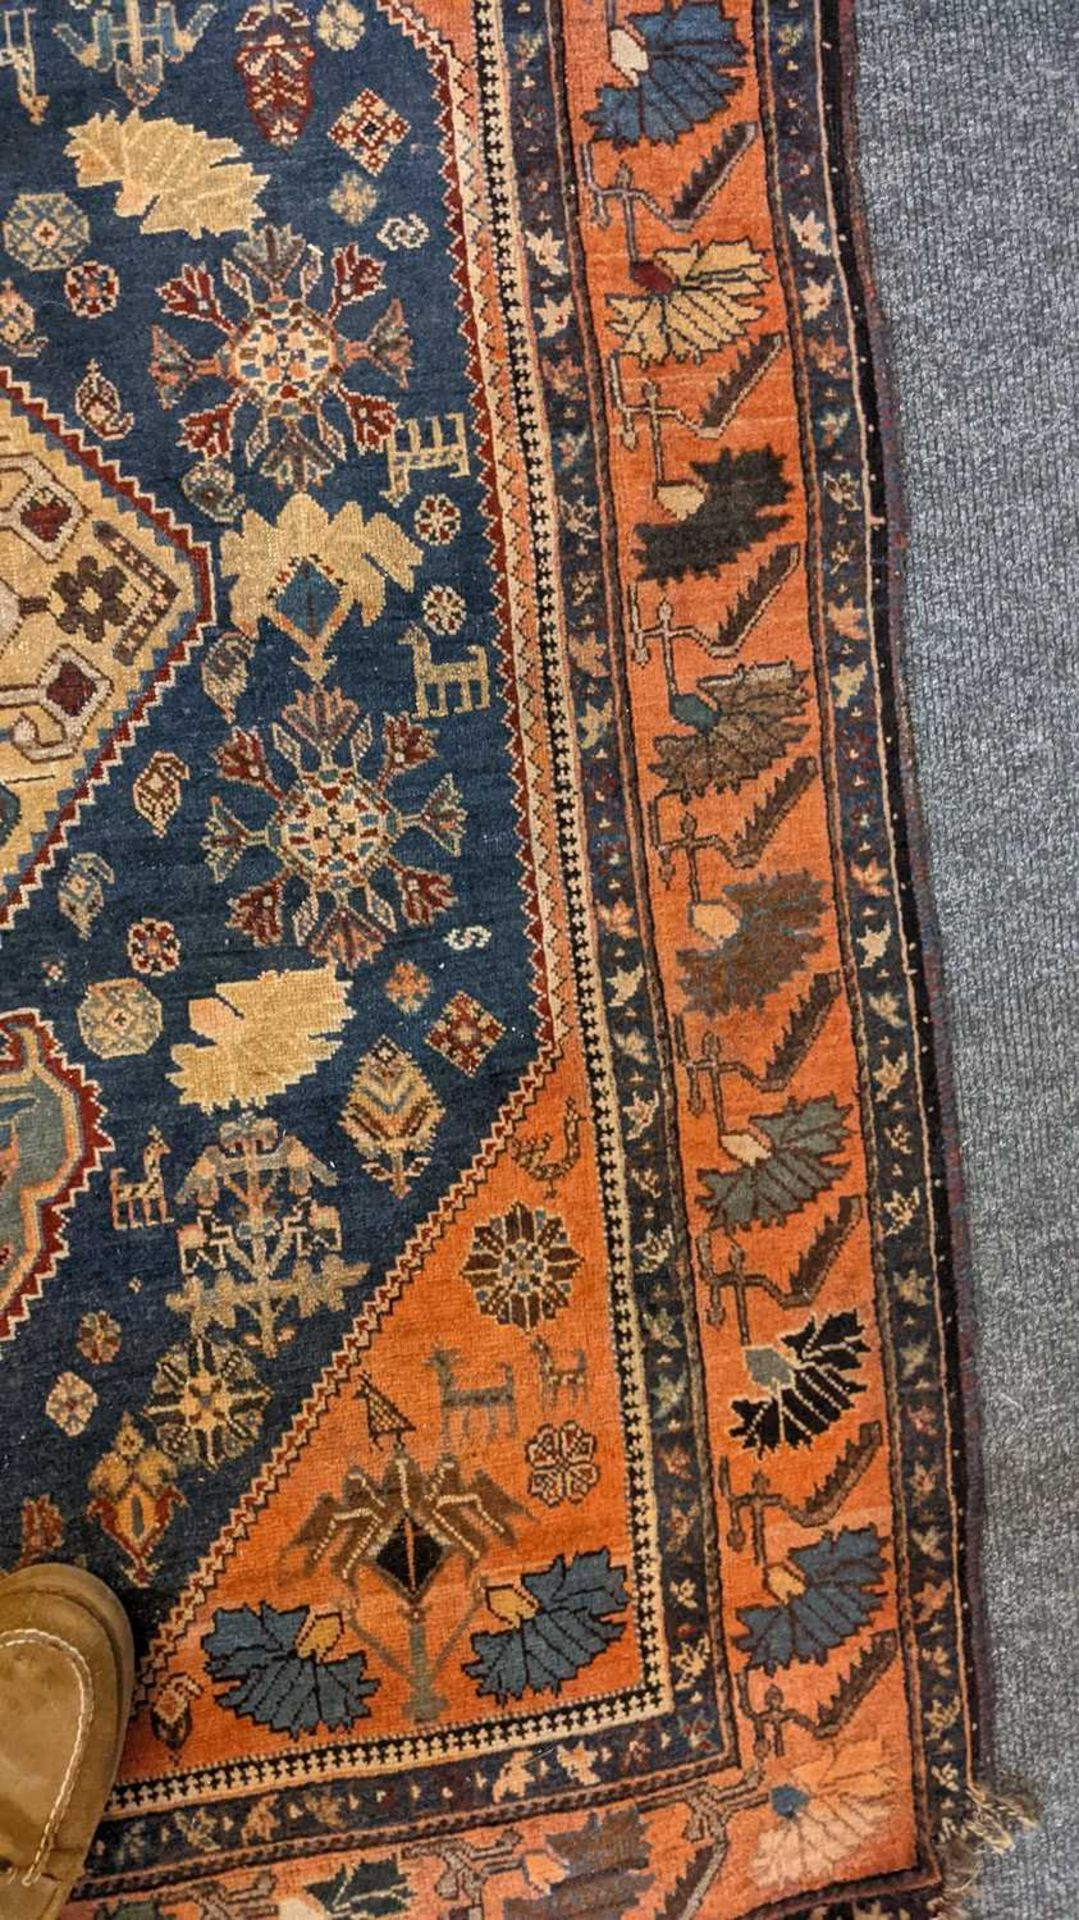 An Afghan Beshir rug, - Image 14 of 17